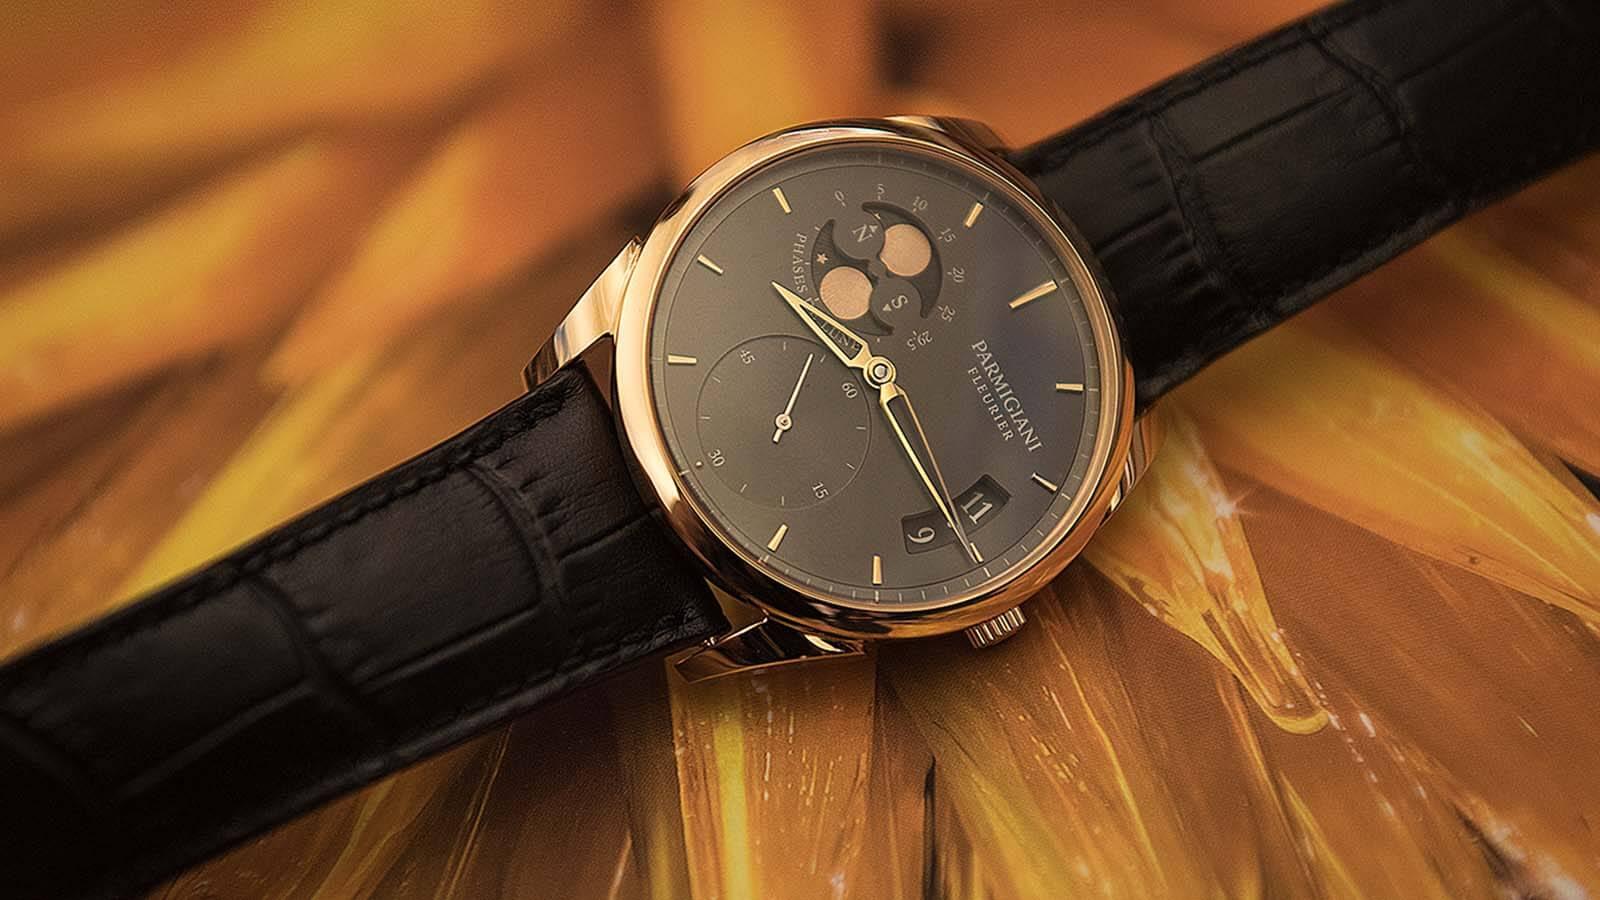 PARMIGIANI FLEURIER Tonda 1950 Lune, eleganten Uhr für Herren